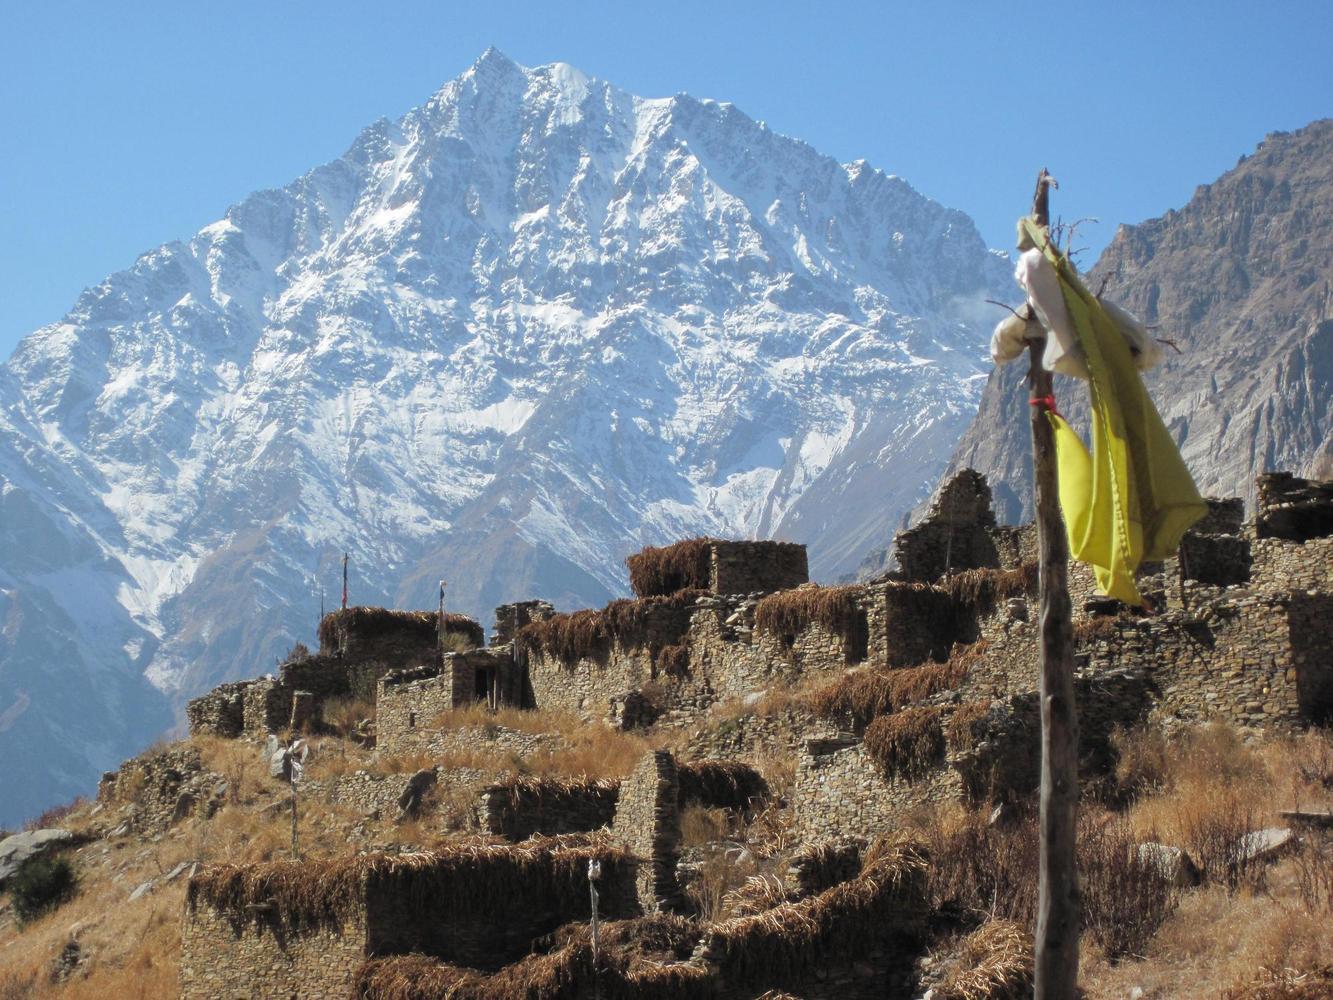 Pisang peak, Nepal - Jean-Luc Moreau